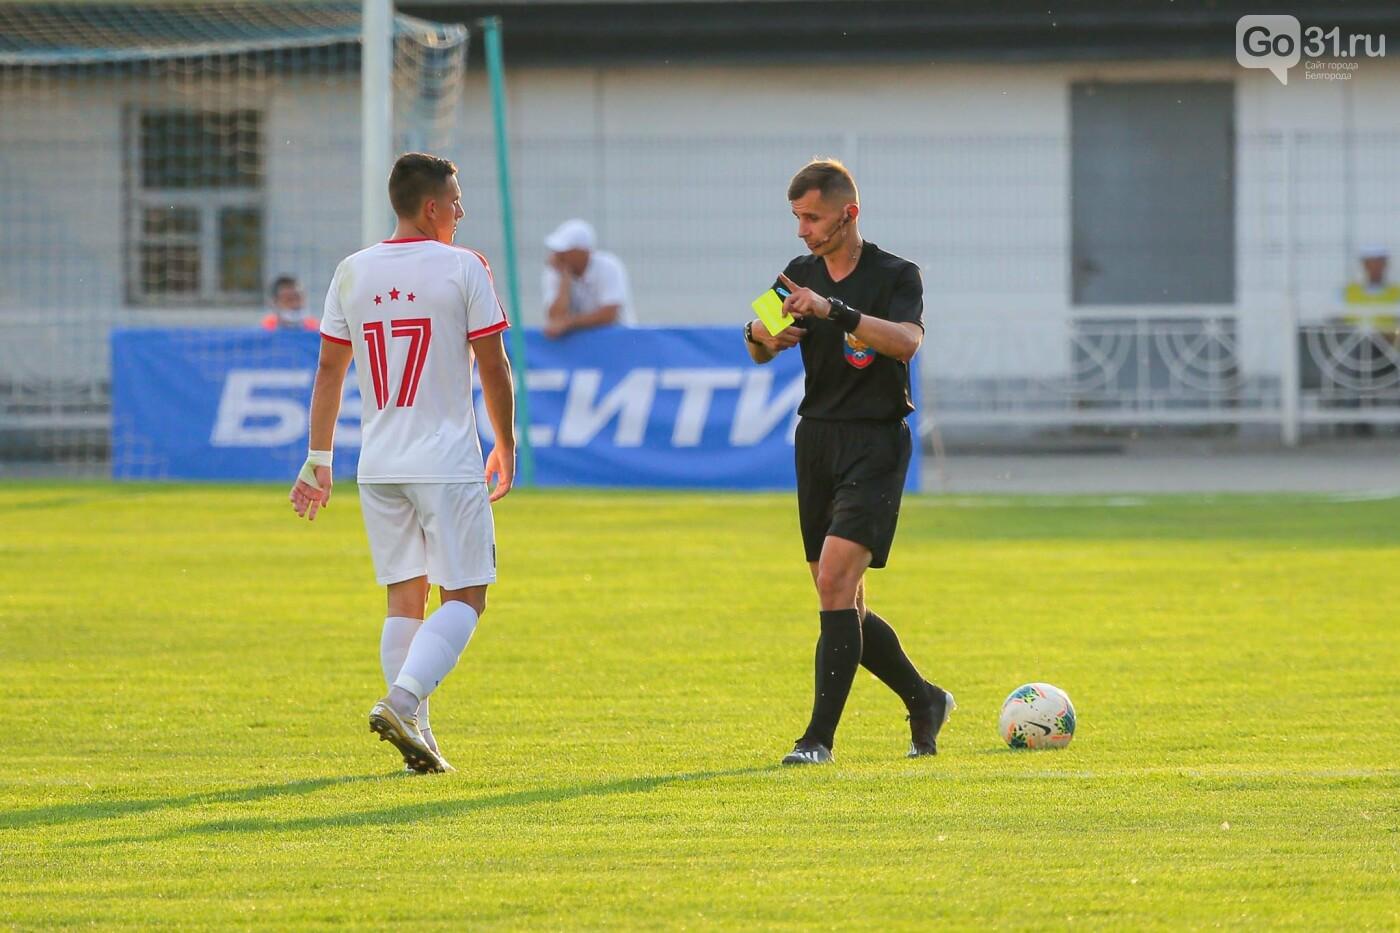 «Салют Белгород»: третья победа подряд, фото-23, Фото: Антон Вергун